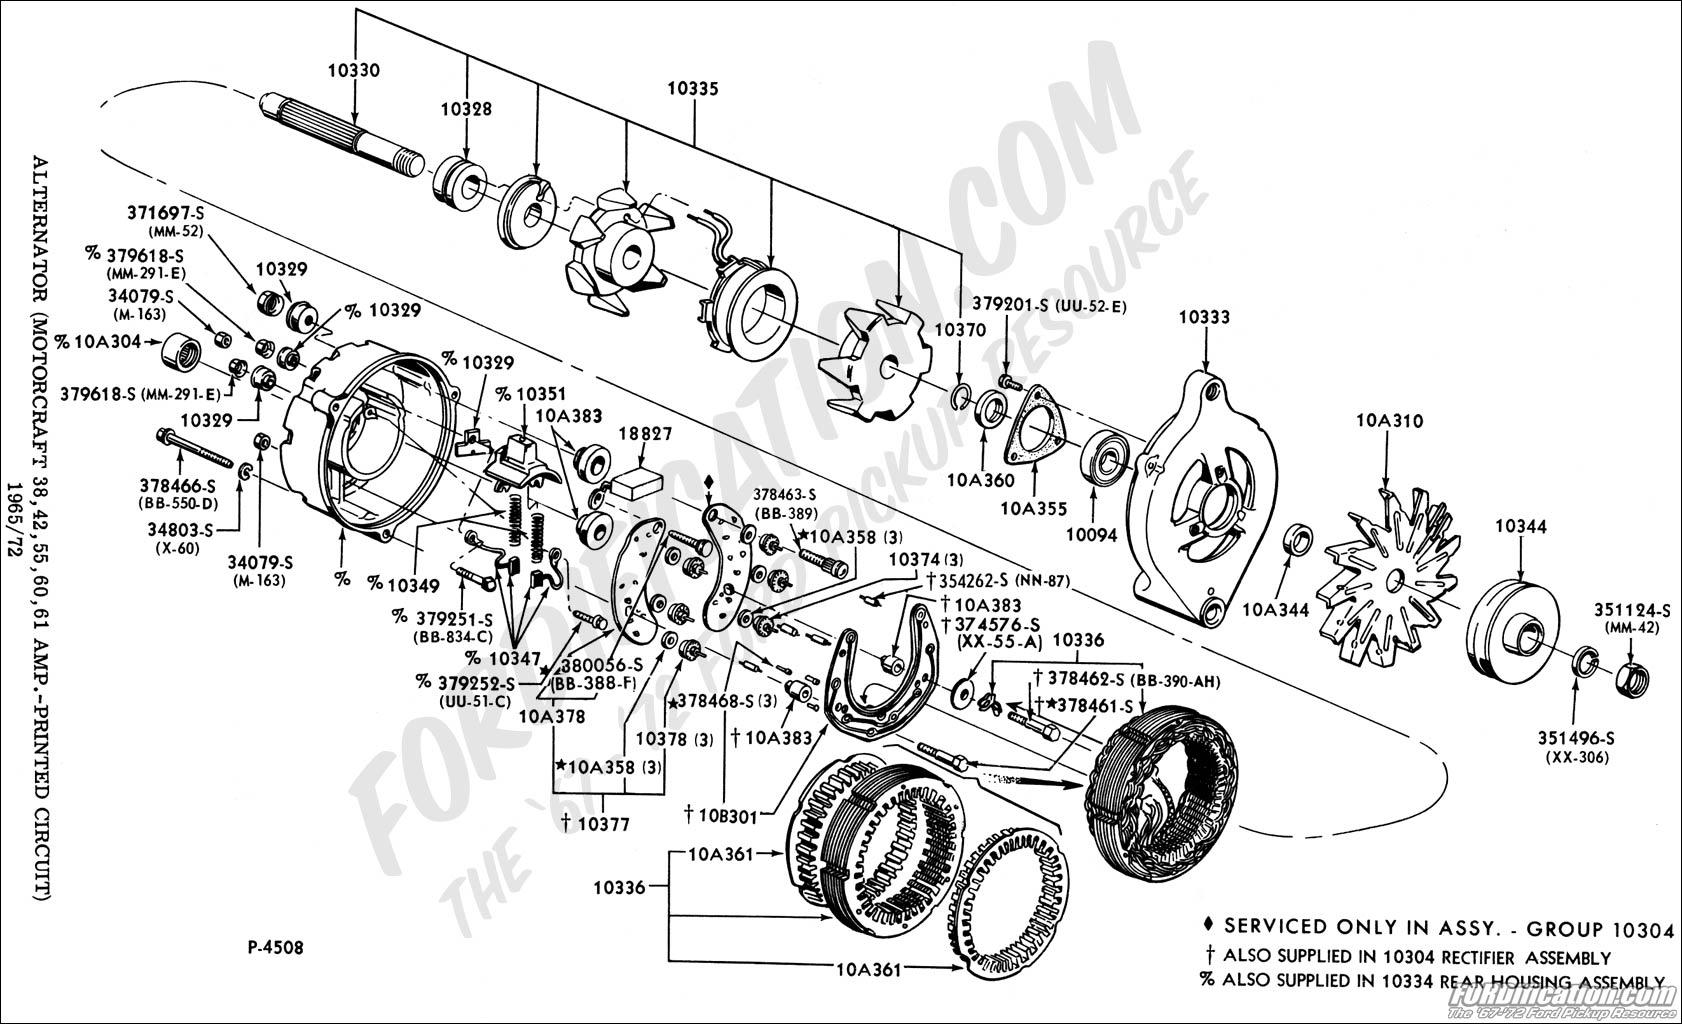 1970 ford f100 turn signal wiring diagram 2005 subaru stereo 1968 schematics axles